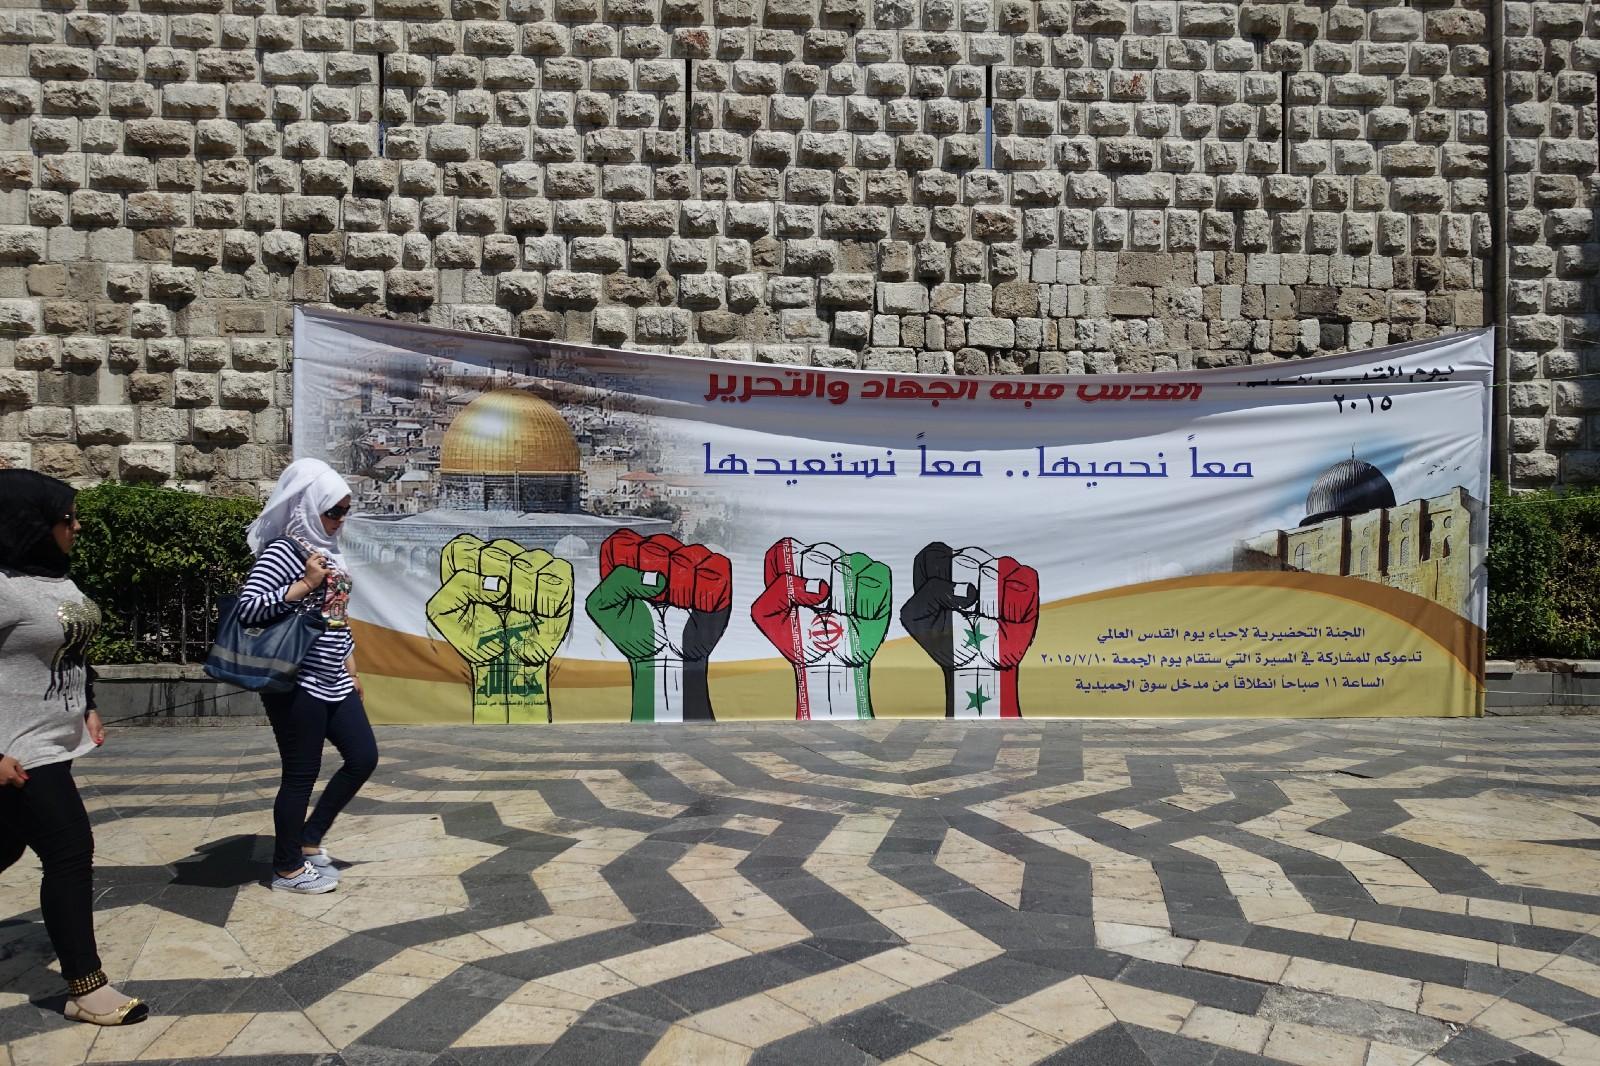 Damascus banner